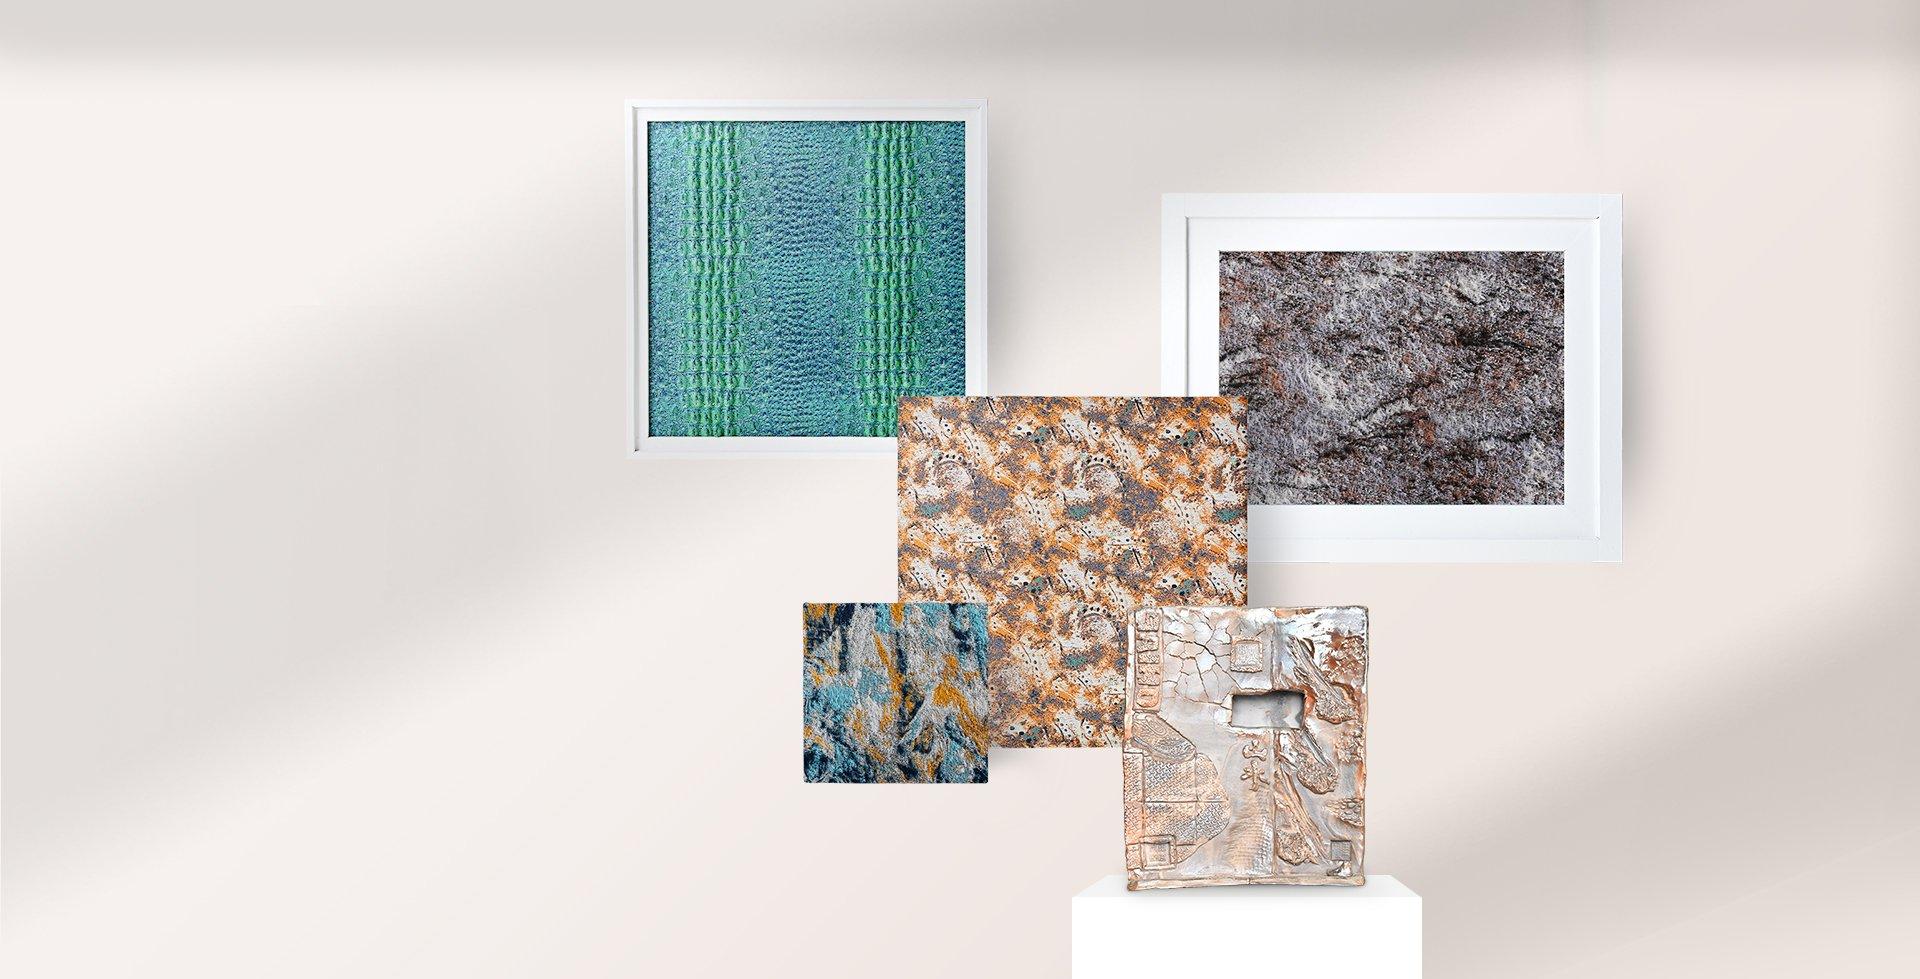 PAIHO Artistic Jacquard Woven Fabric